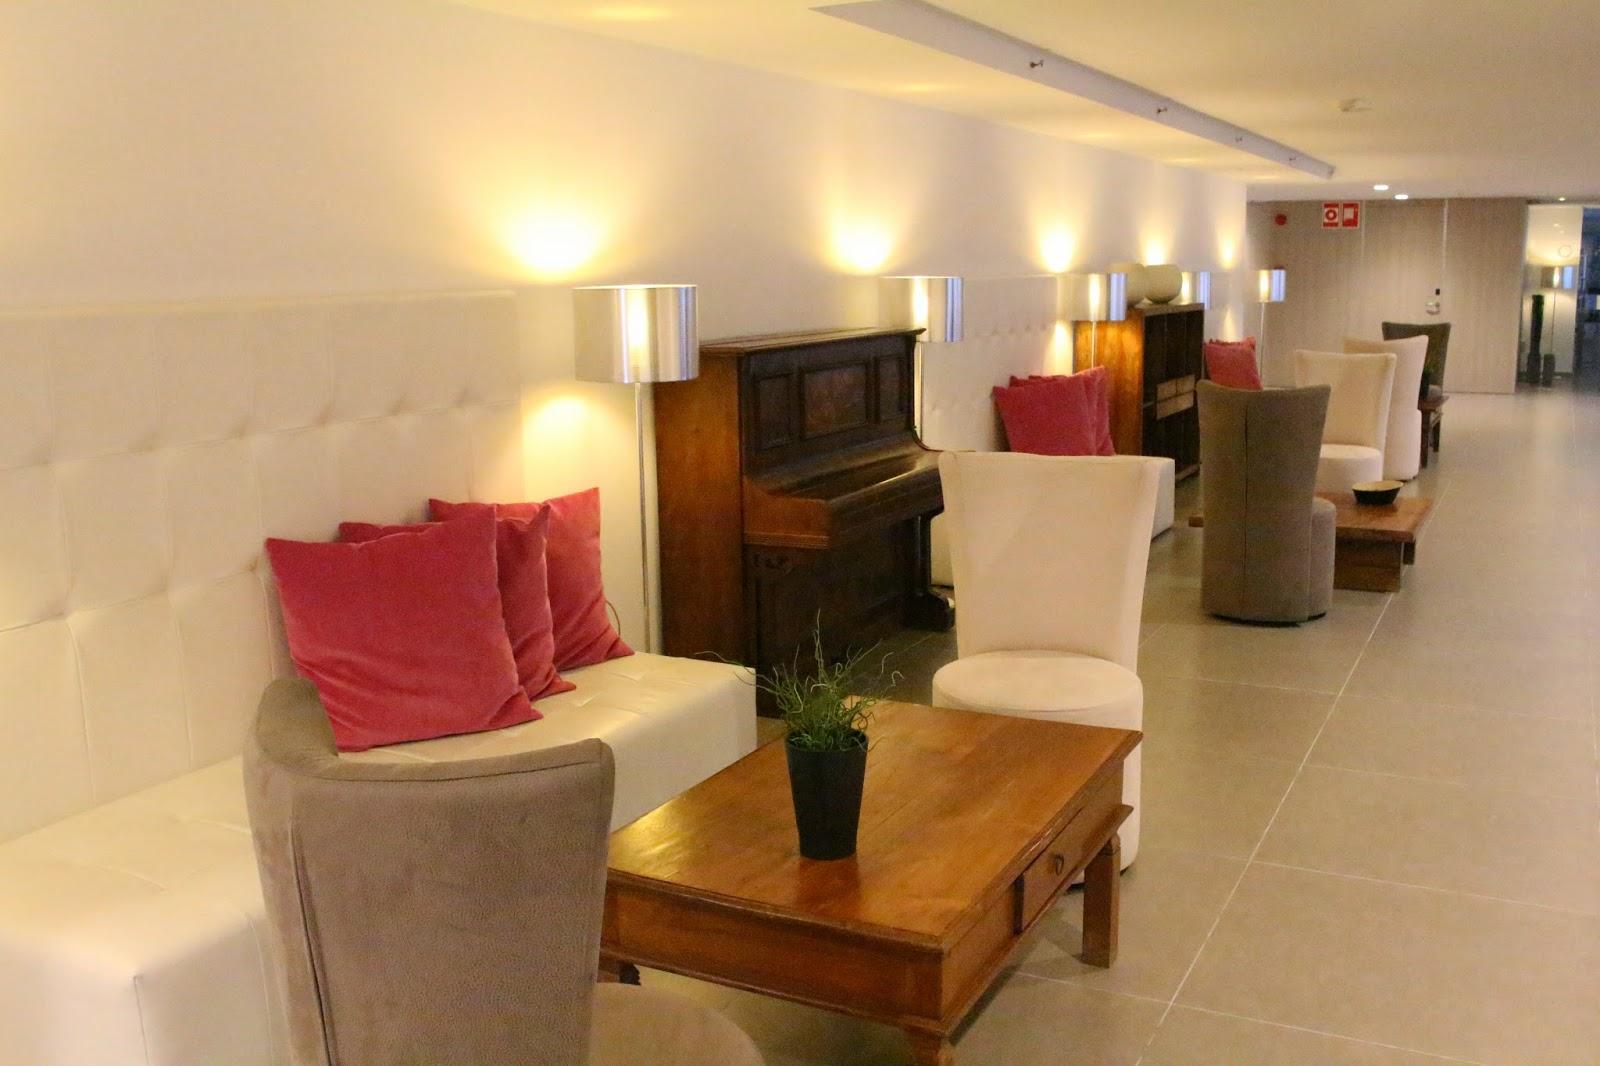 Fergus Hotel Mar Mediterrania Santa Susanna Spain guest area